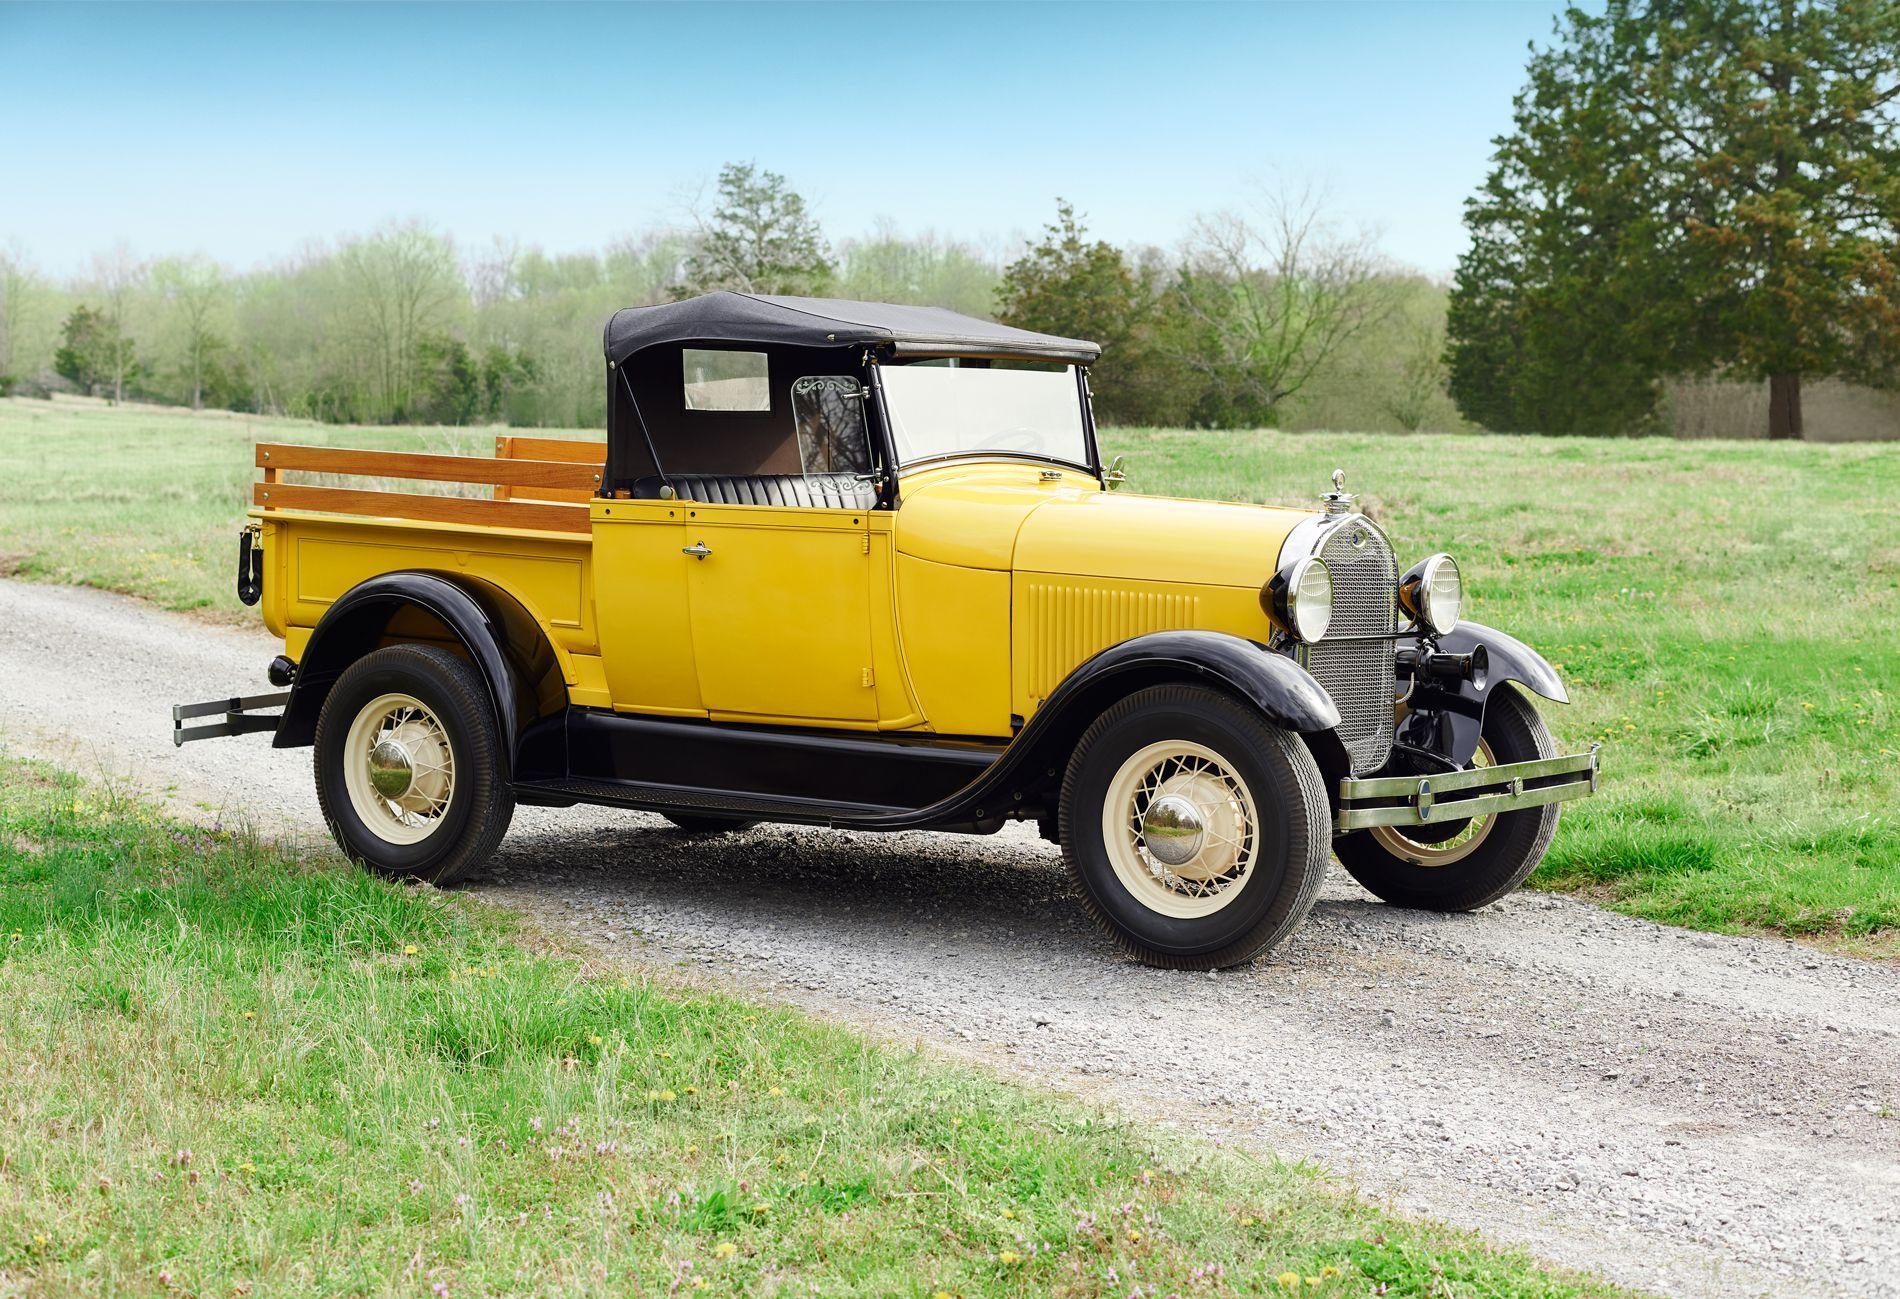 Classic American Pickup Trucks - History of Pickup Trucks